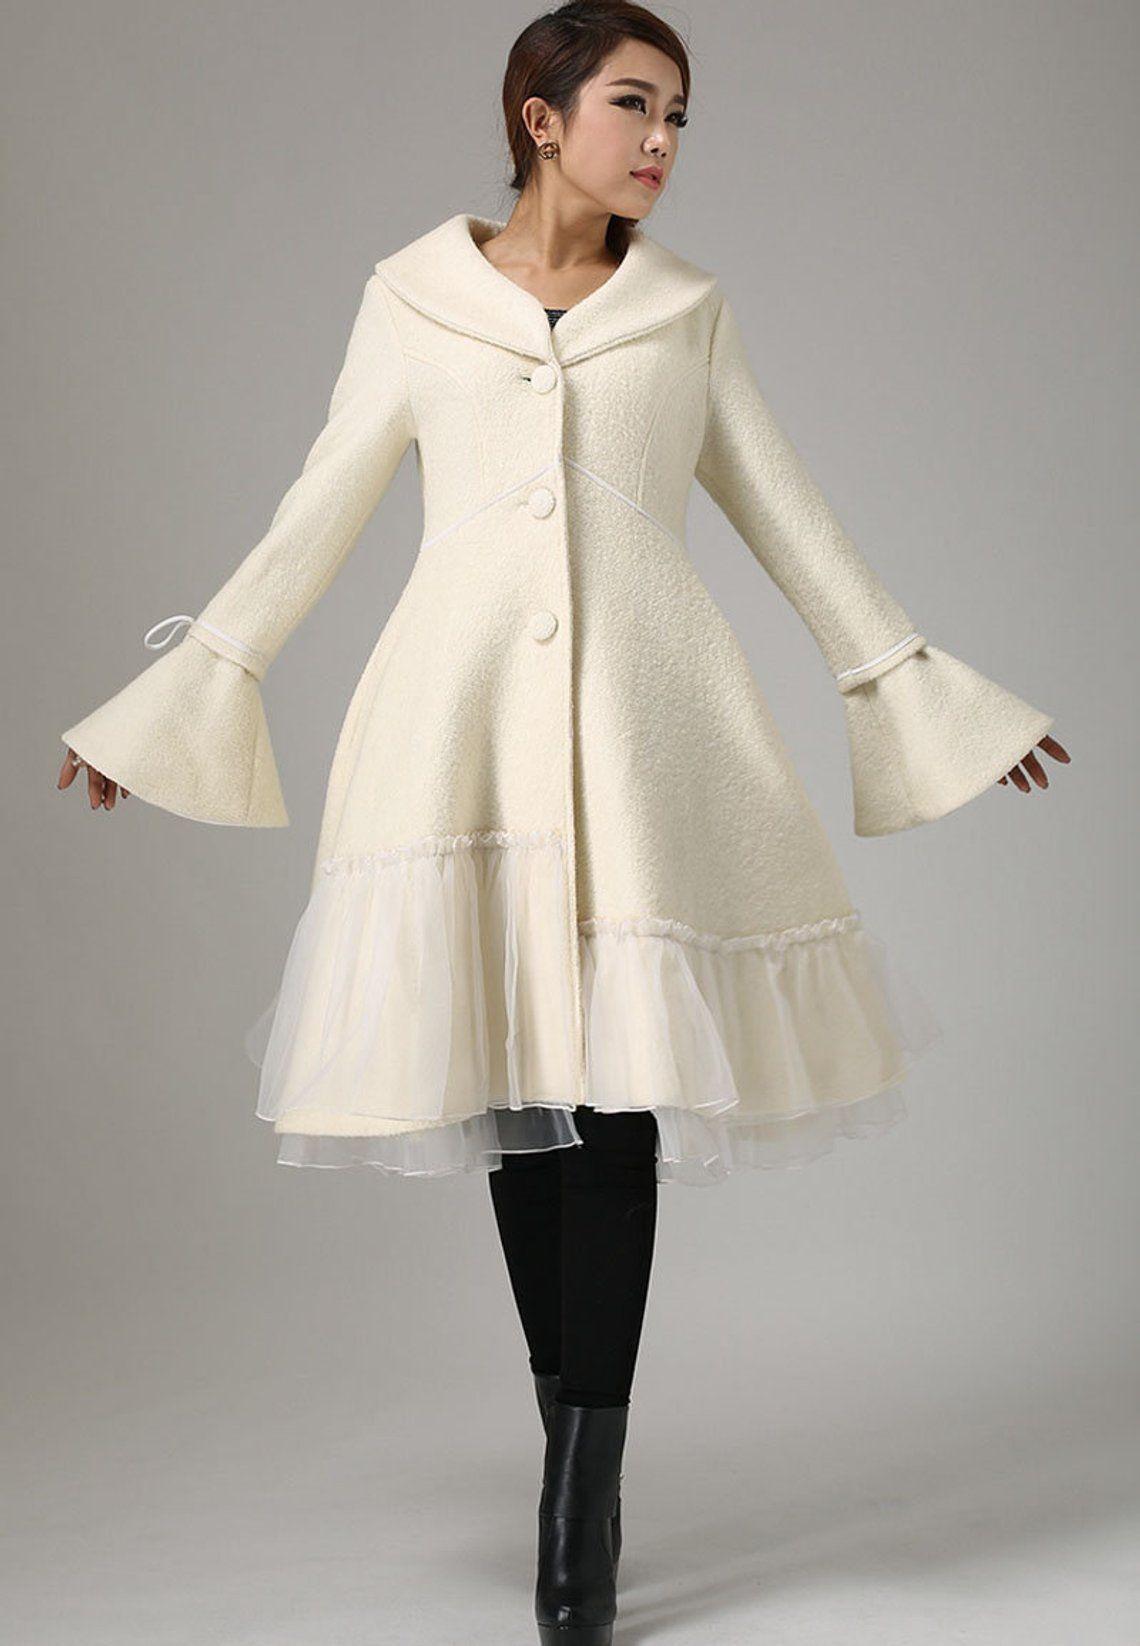 White Wool Coat Wool Coat Winter Coat Wool Coat For Women Etsy Asian Style Dress Fall Fashion Coats White Wool Coat [ 1646 x 1140 Pixel ]